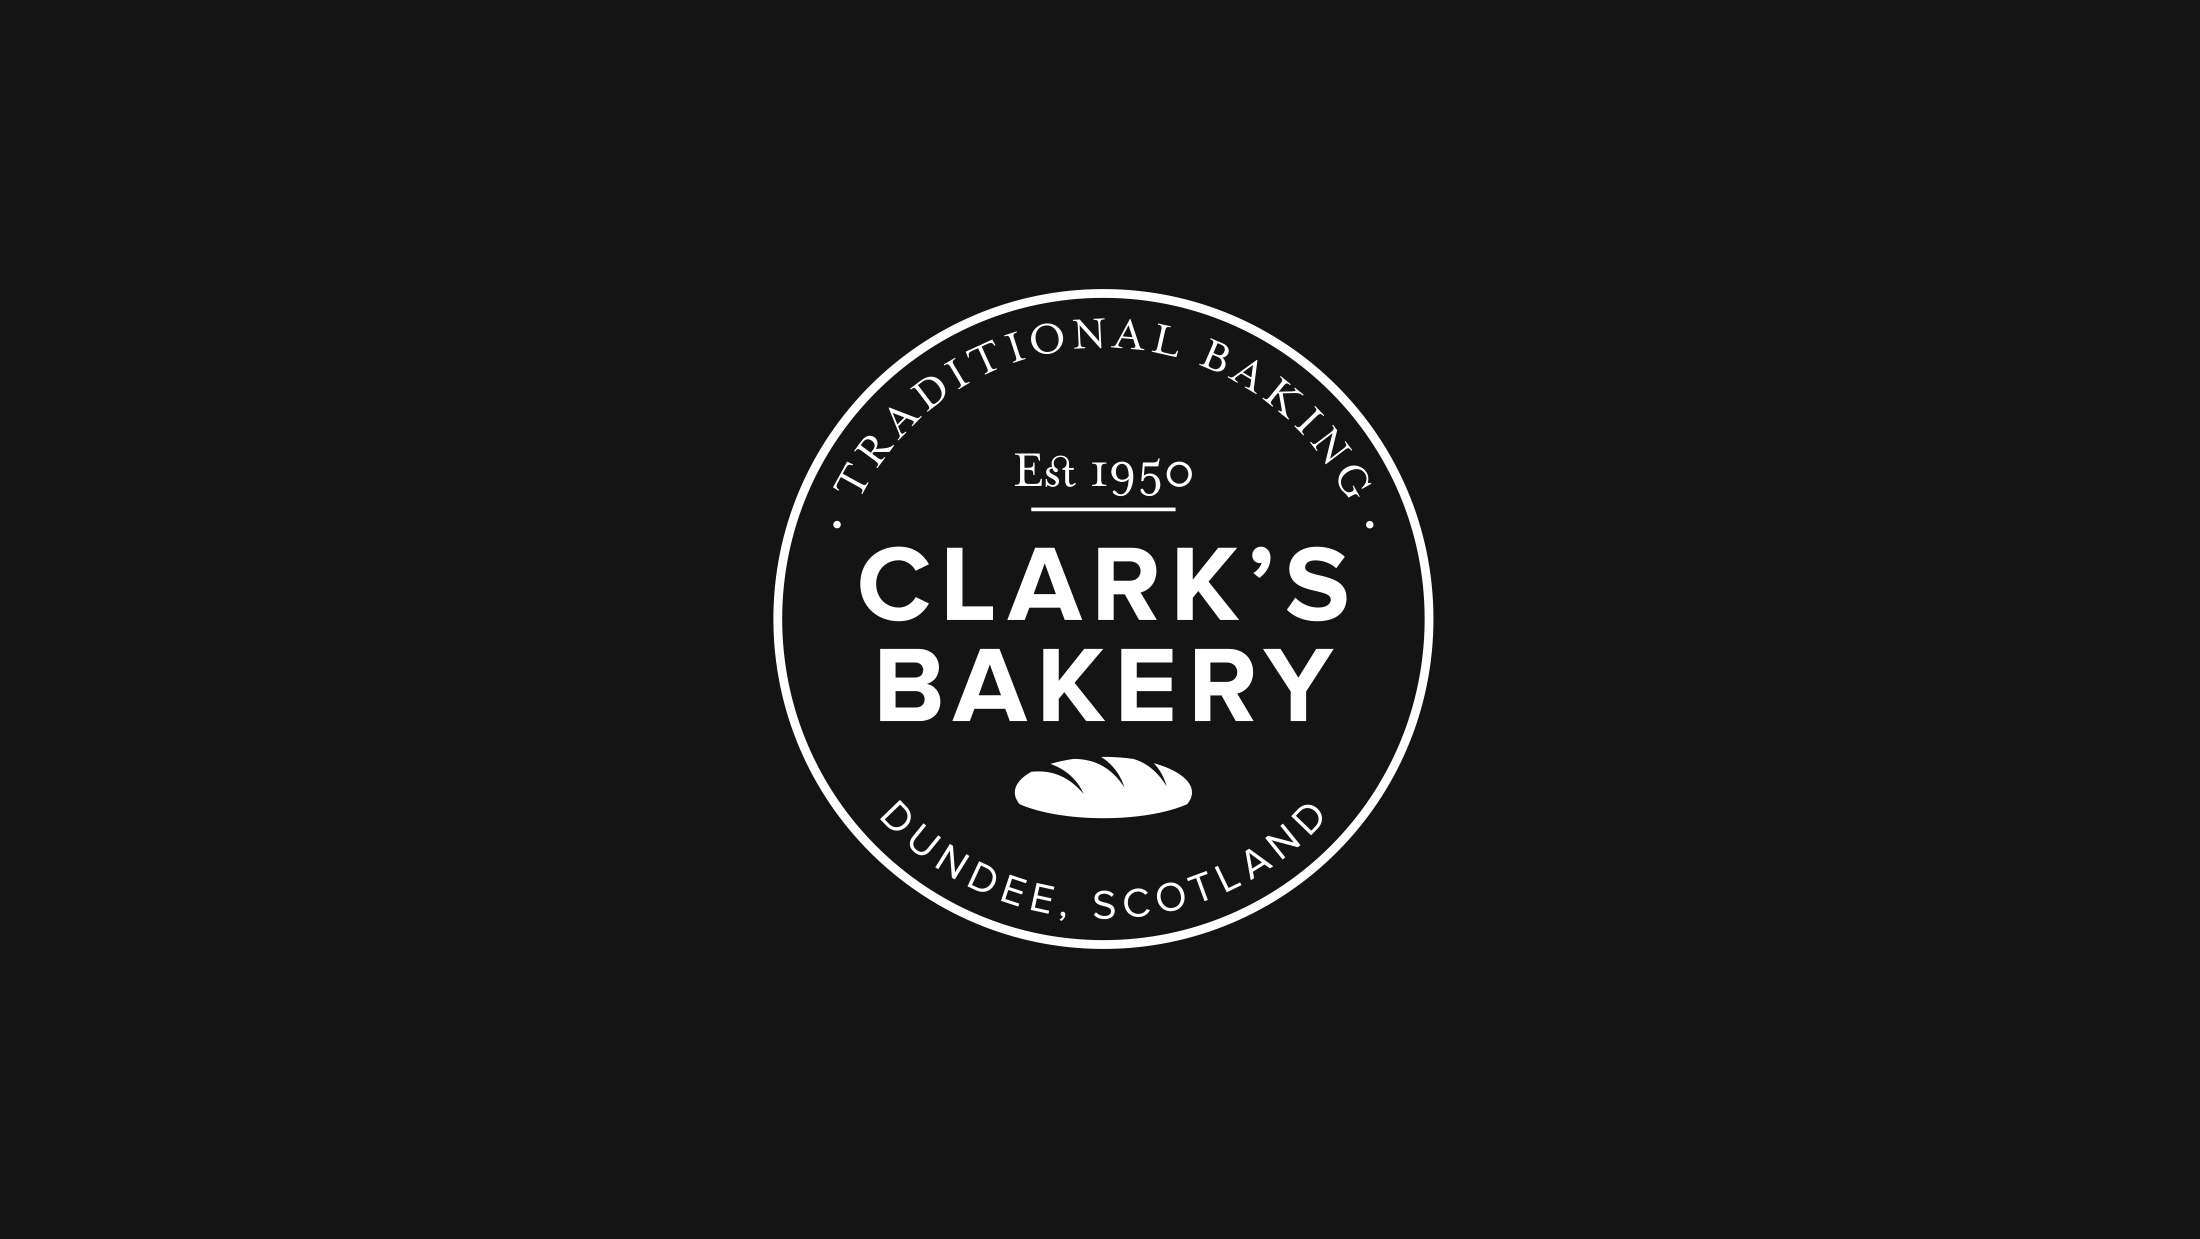 White circular Clark's Bakery logo on a black background